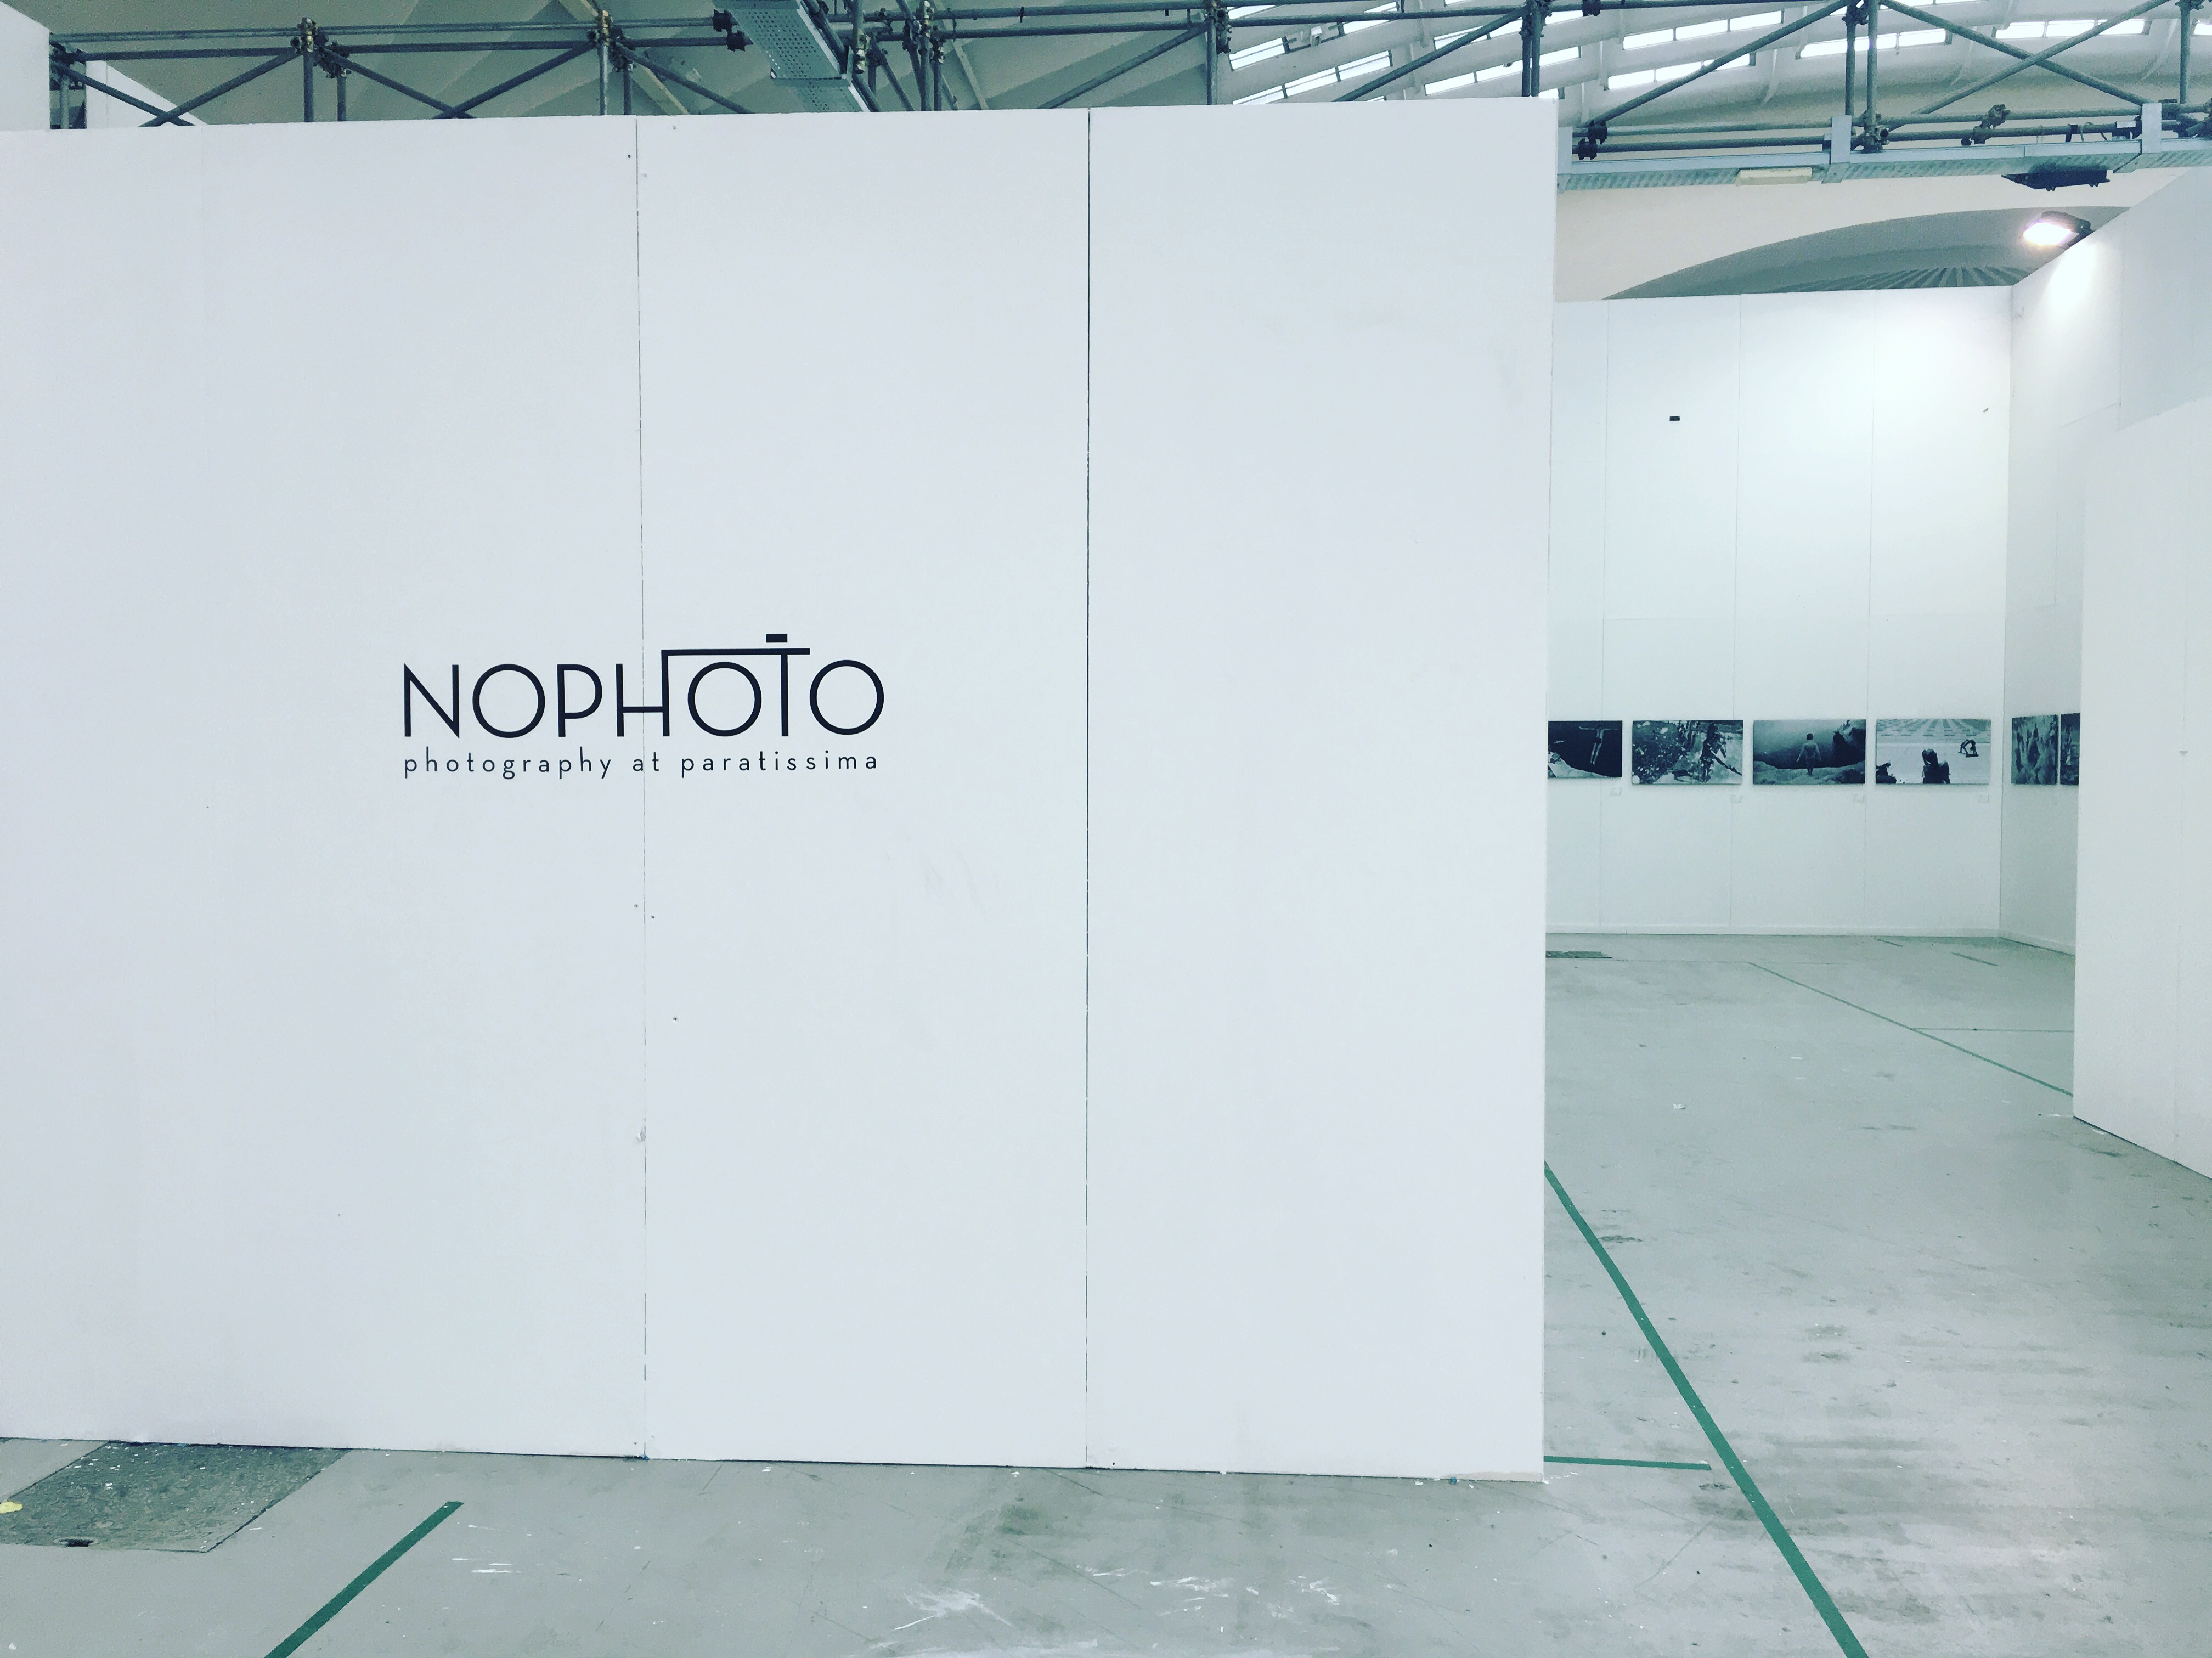 nophoto-paratissima-2016-talentieventi